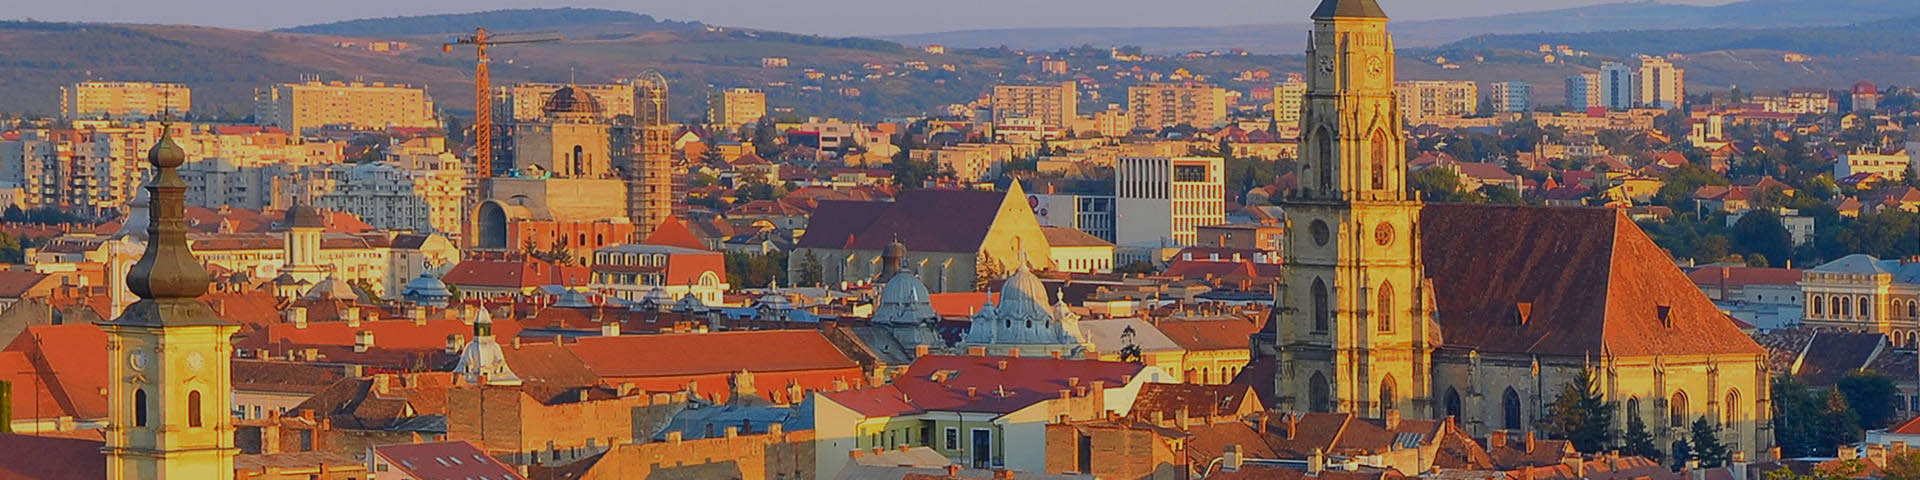 Cluj hero edit